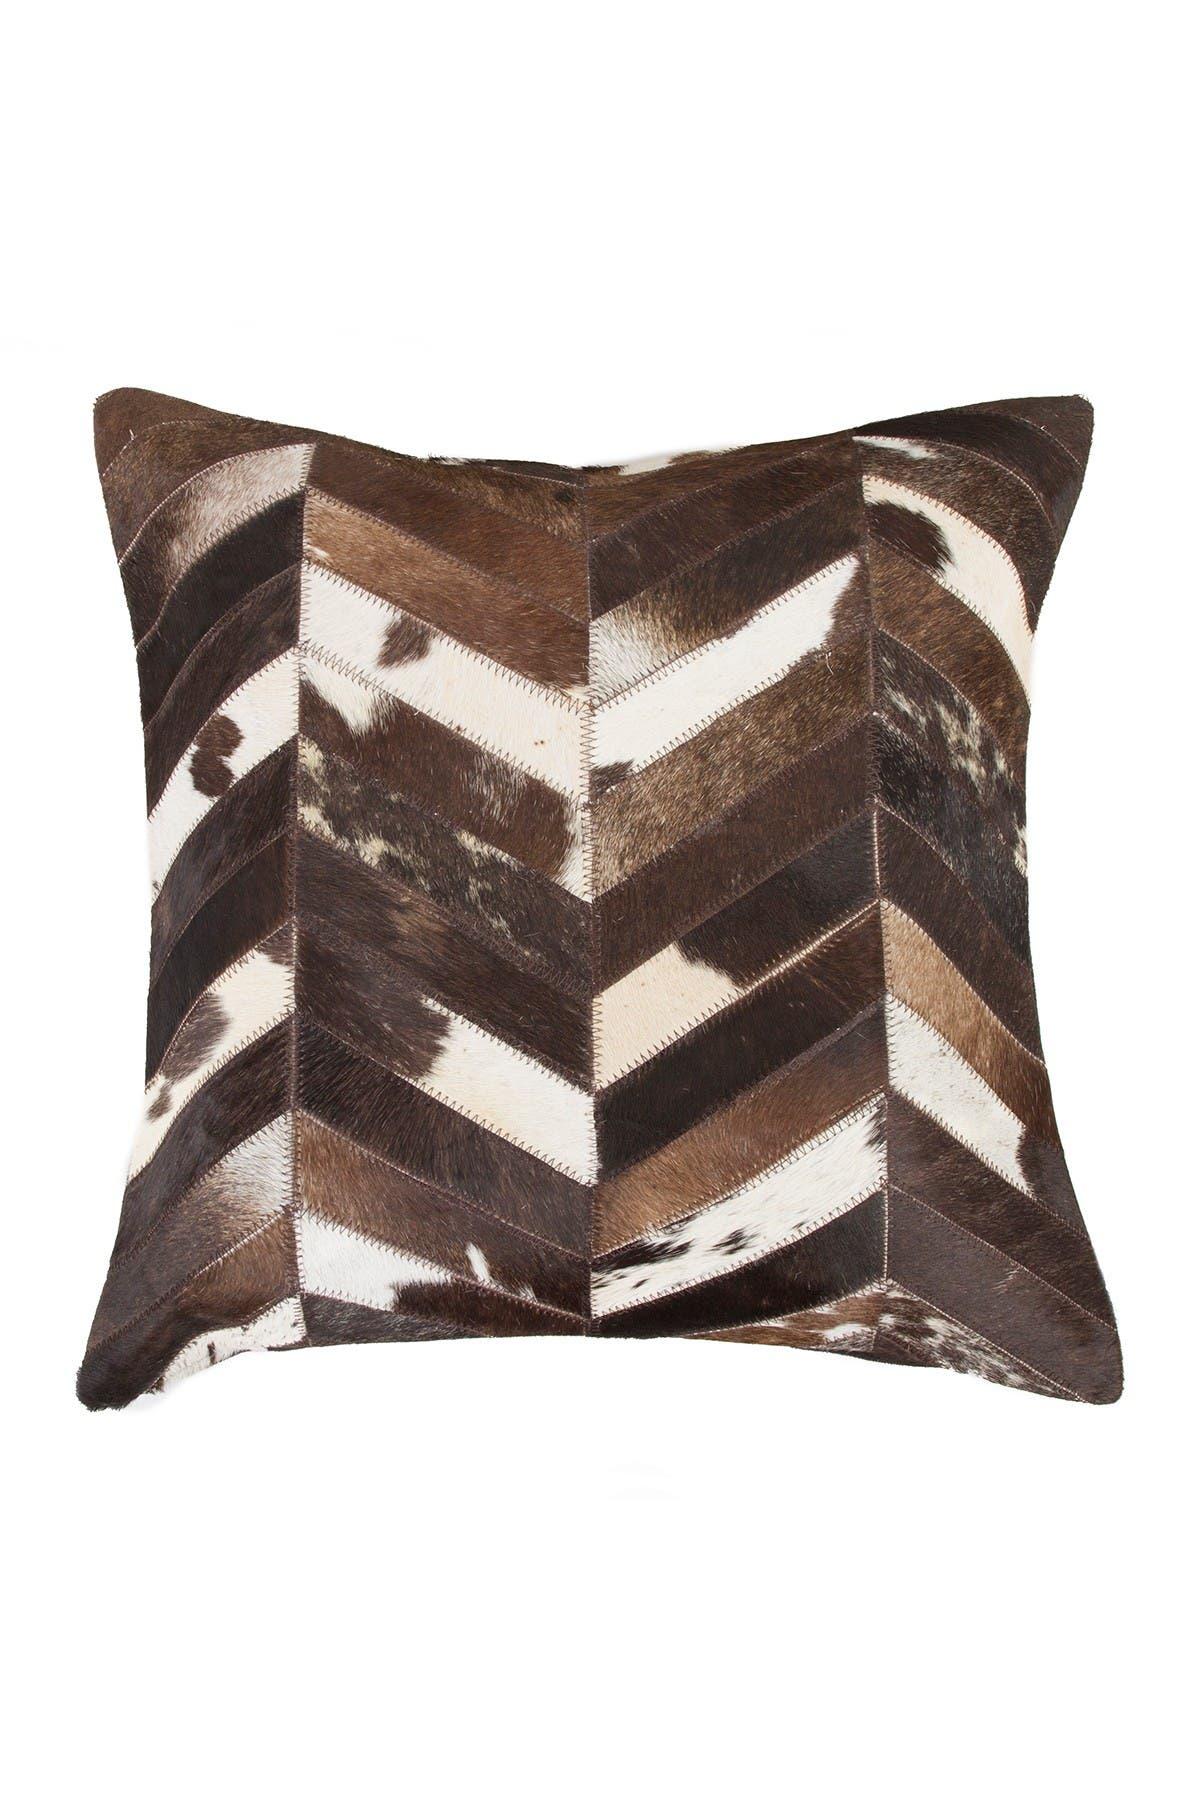 "Image of Natural Torino Chevron Genuine Cowhide Pillow - 18""x18"" - Chocolate/Natural"